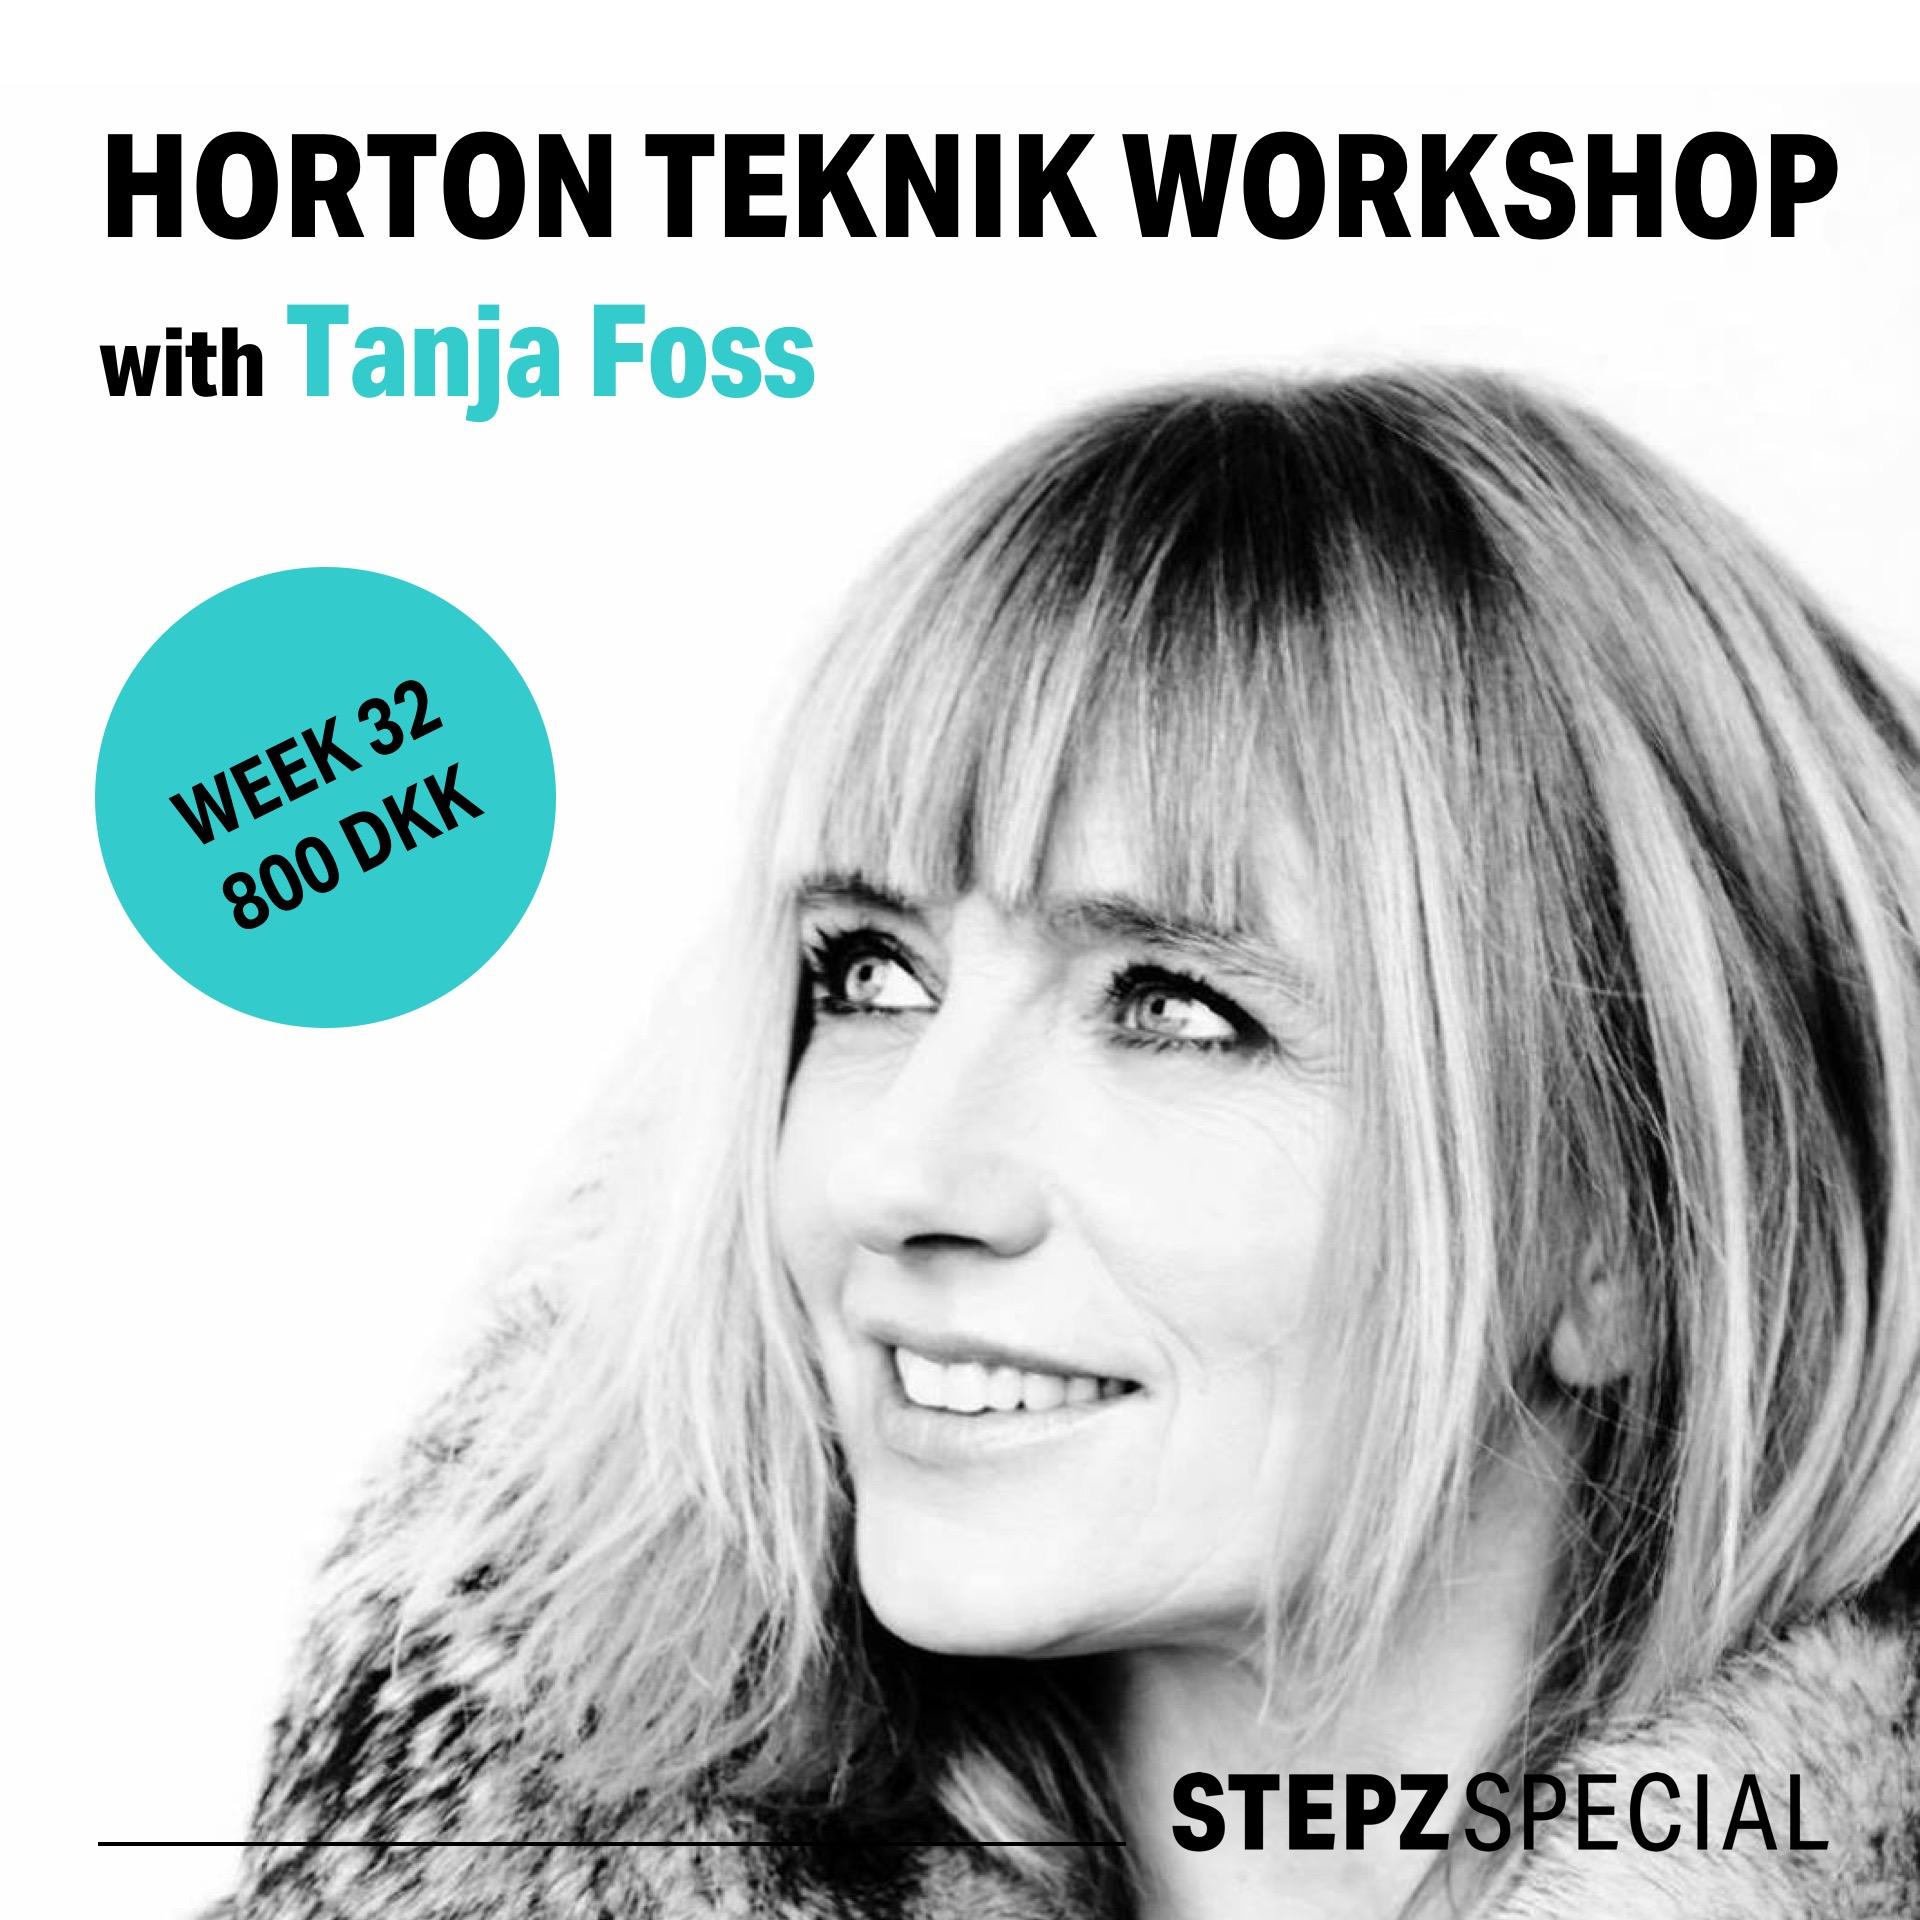 Tanja Foss / Horton Teknik